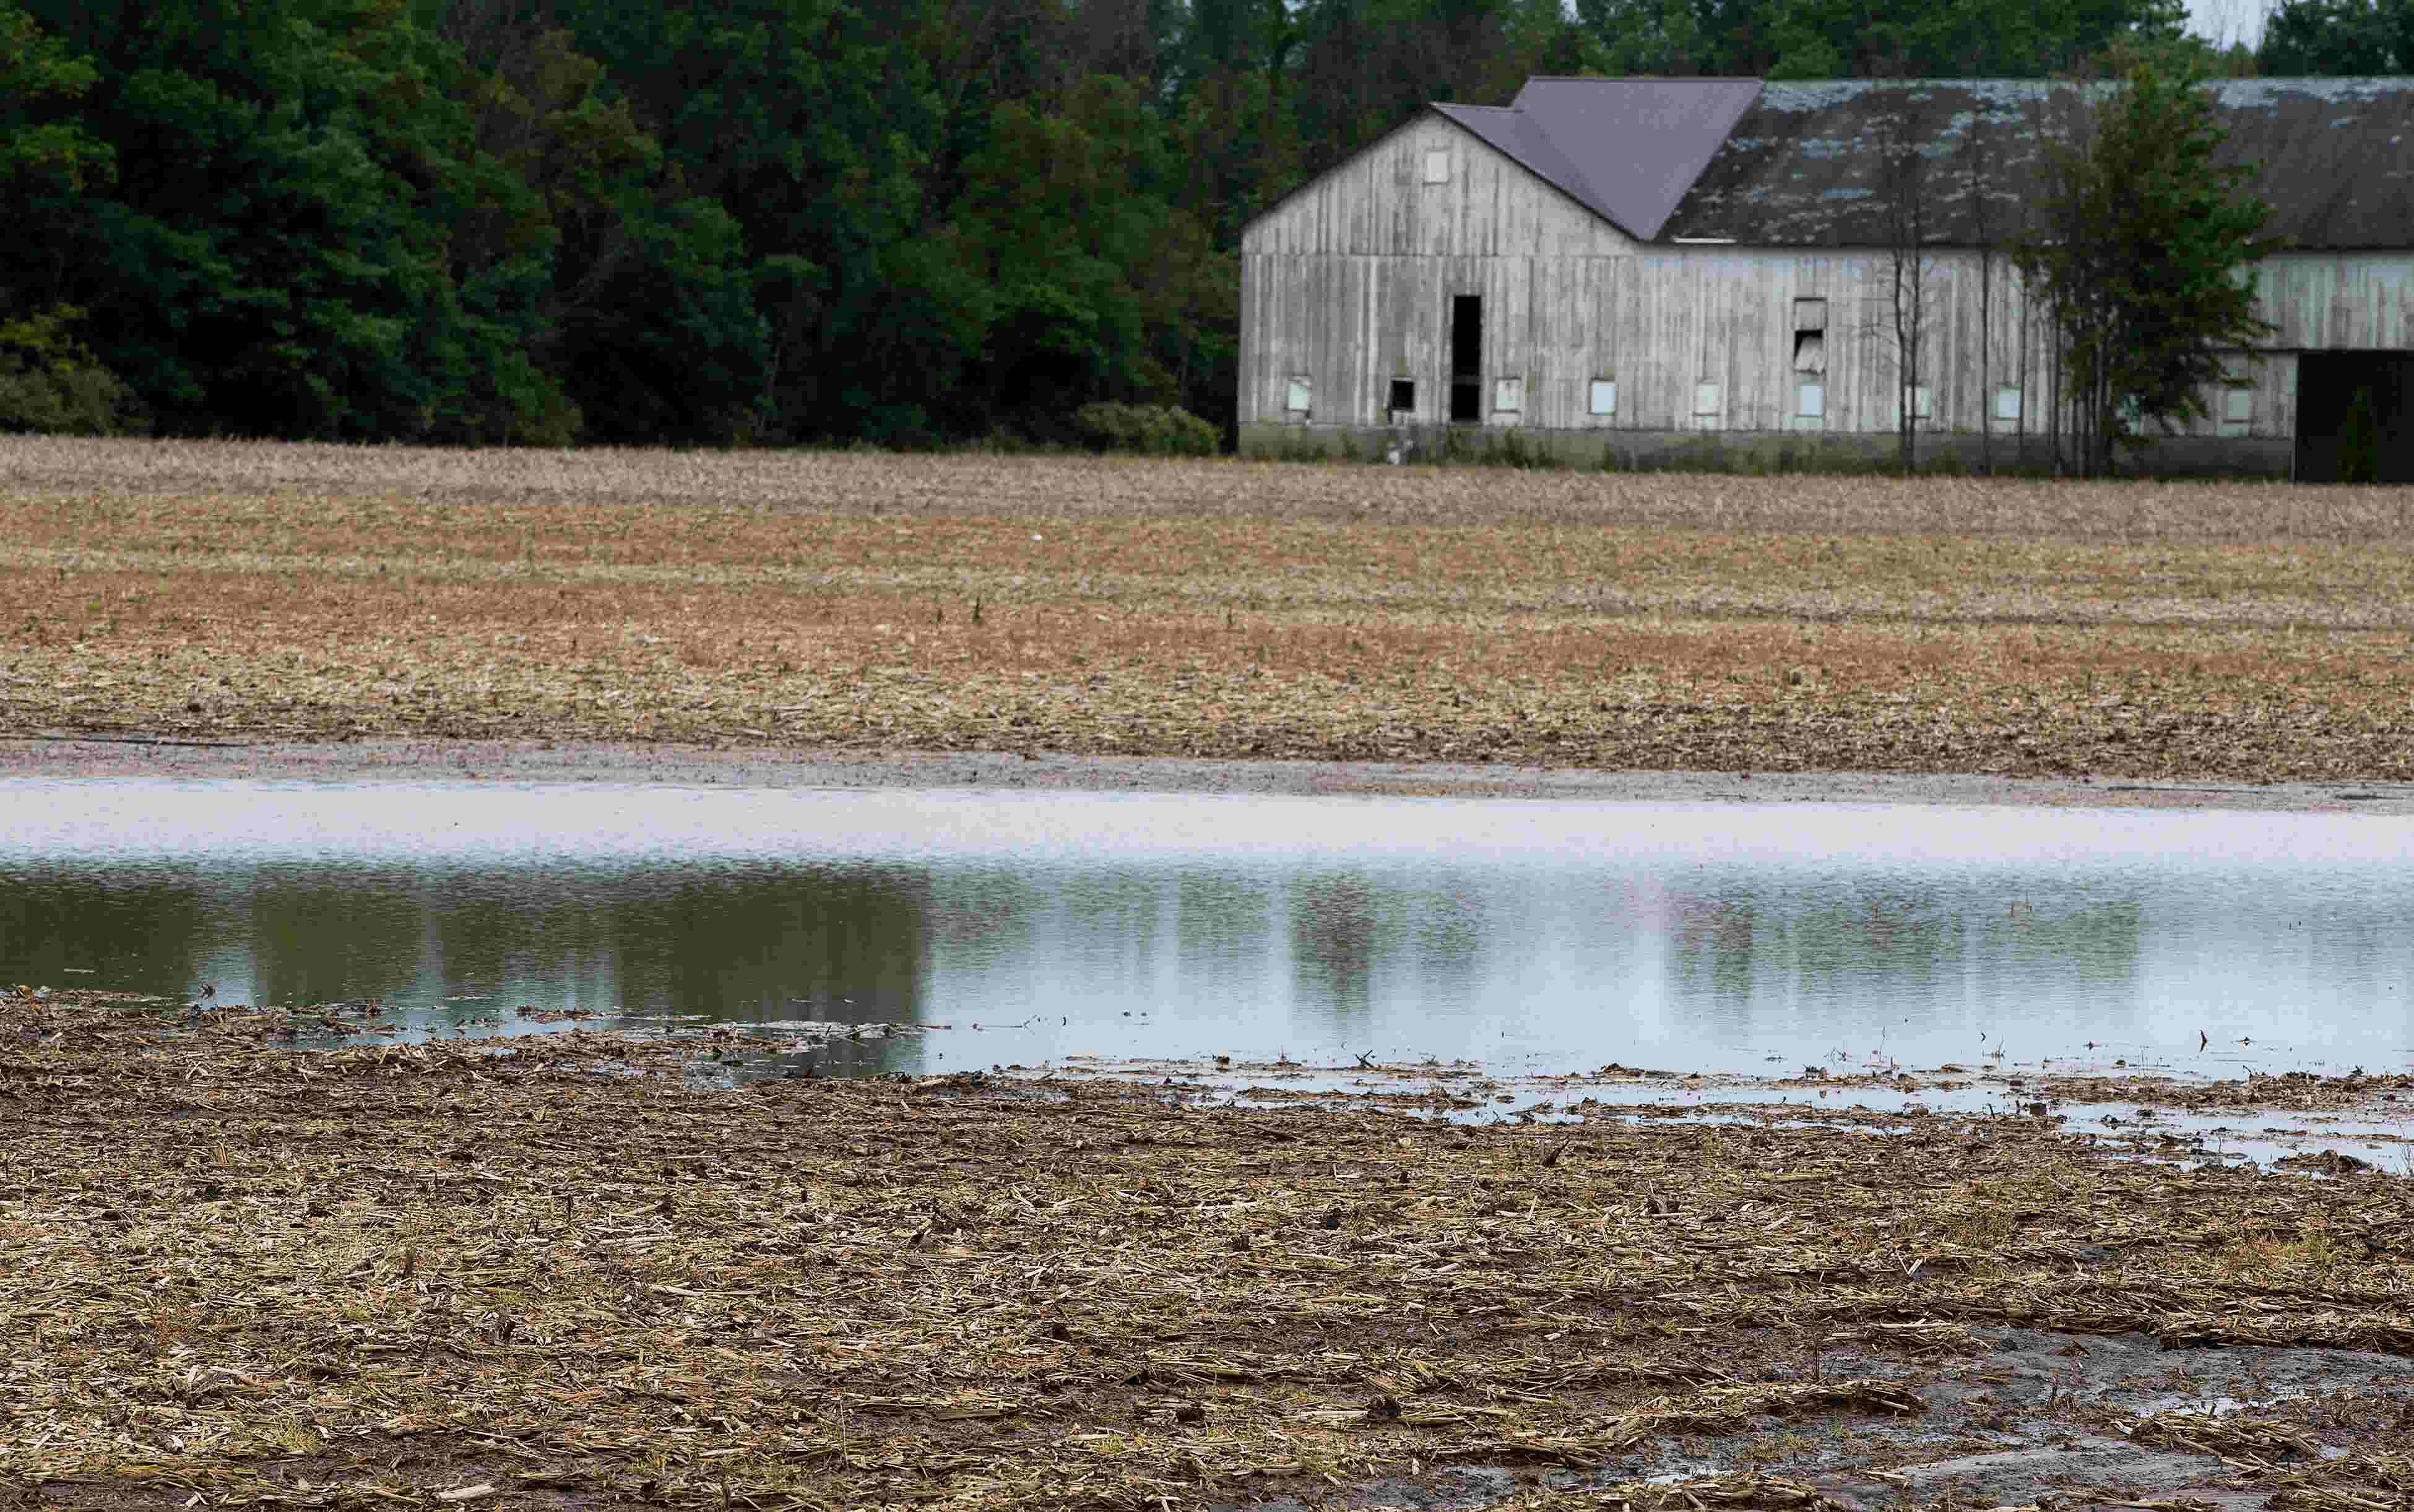 Rainfall woes: Cincinnati has gotten nearly 3 feet of rain so far this year